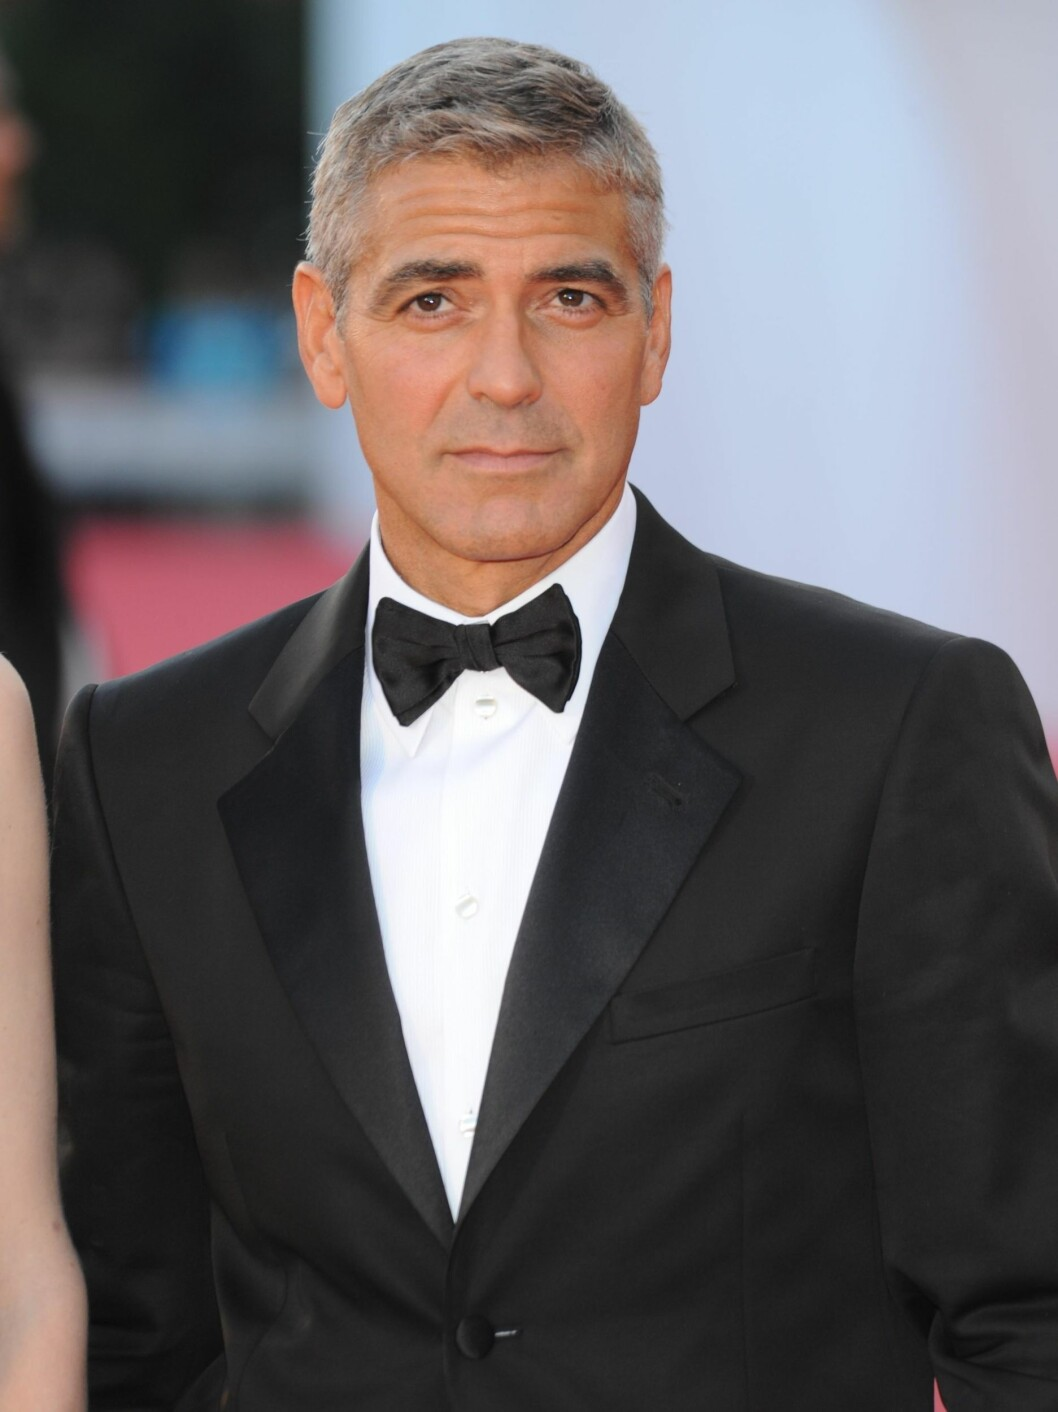 NUMMER SYV: George Clooney. Foto: Stella Pictures